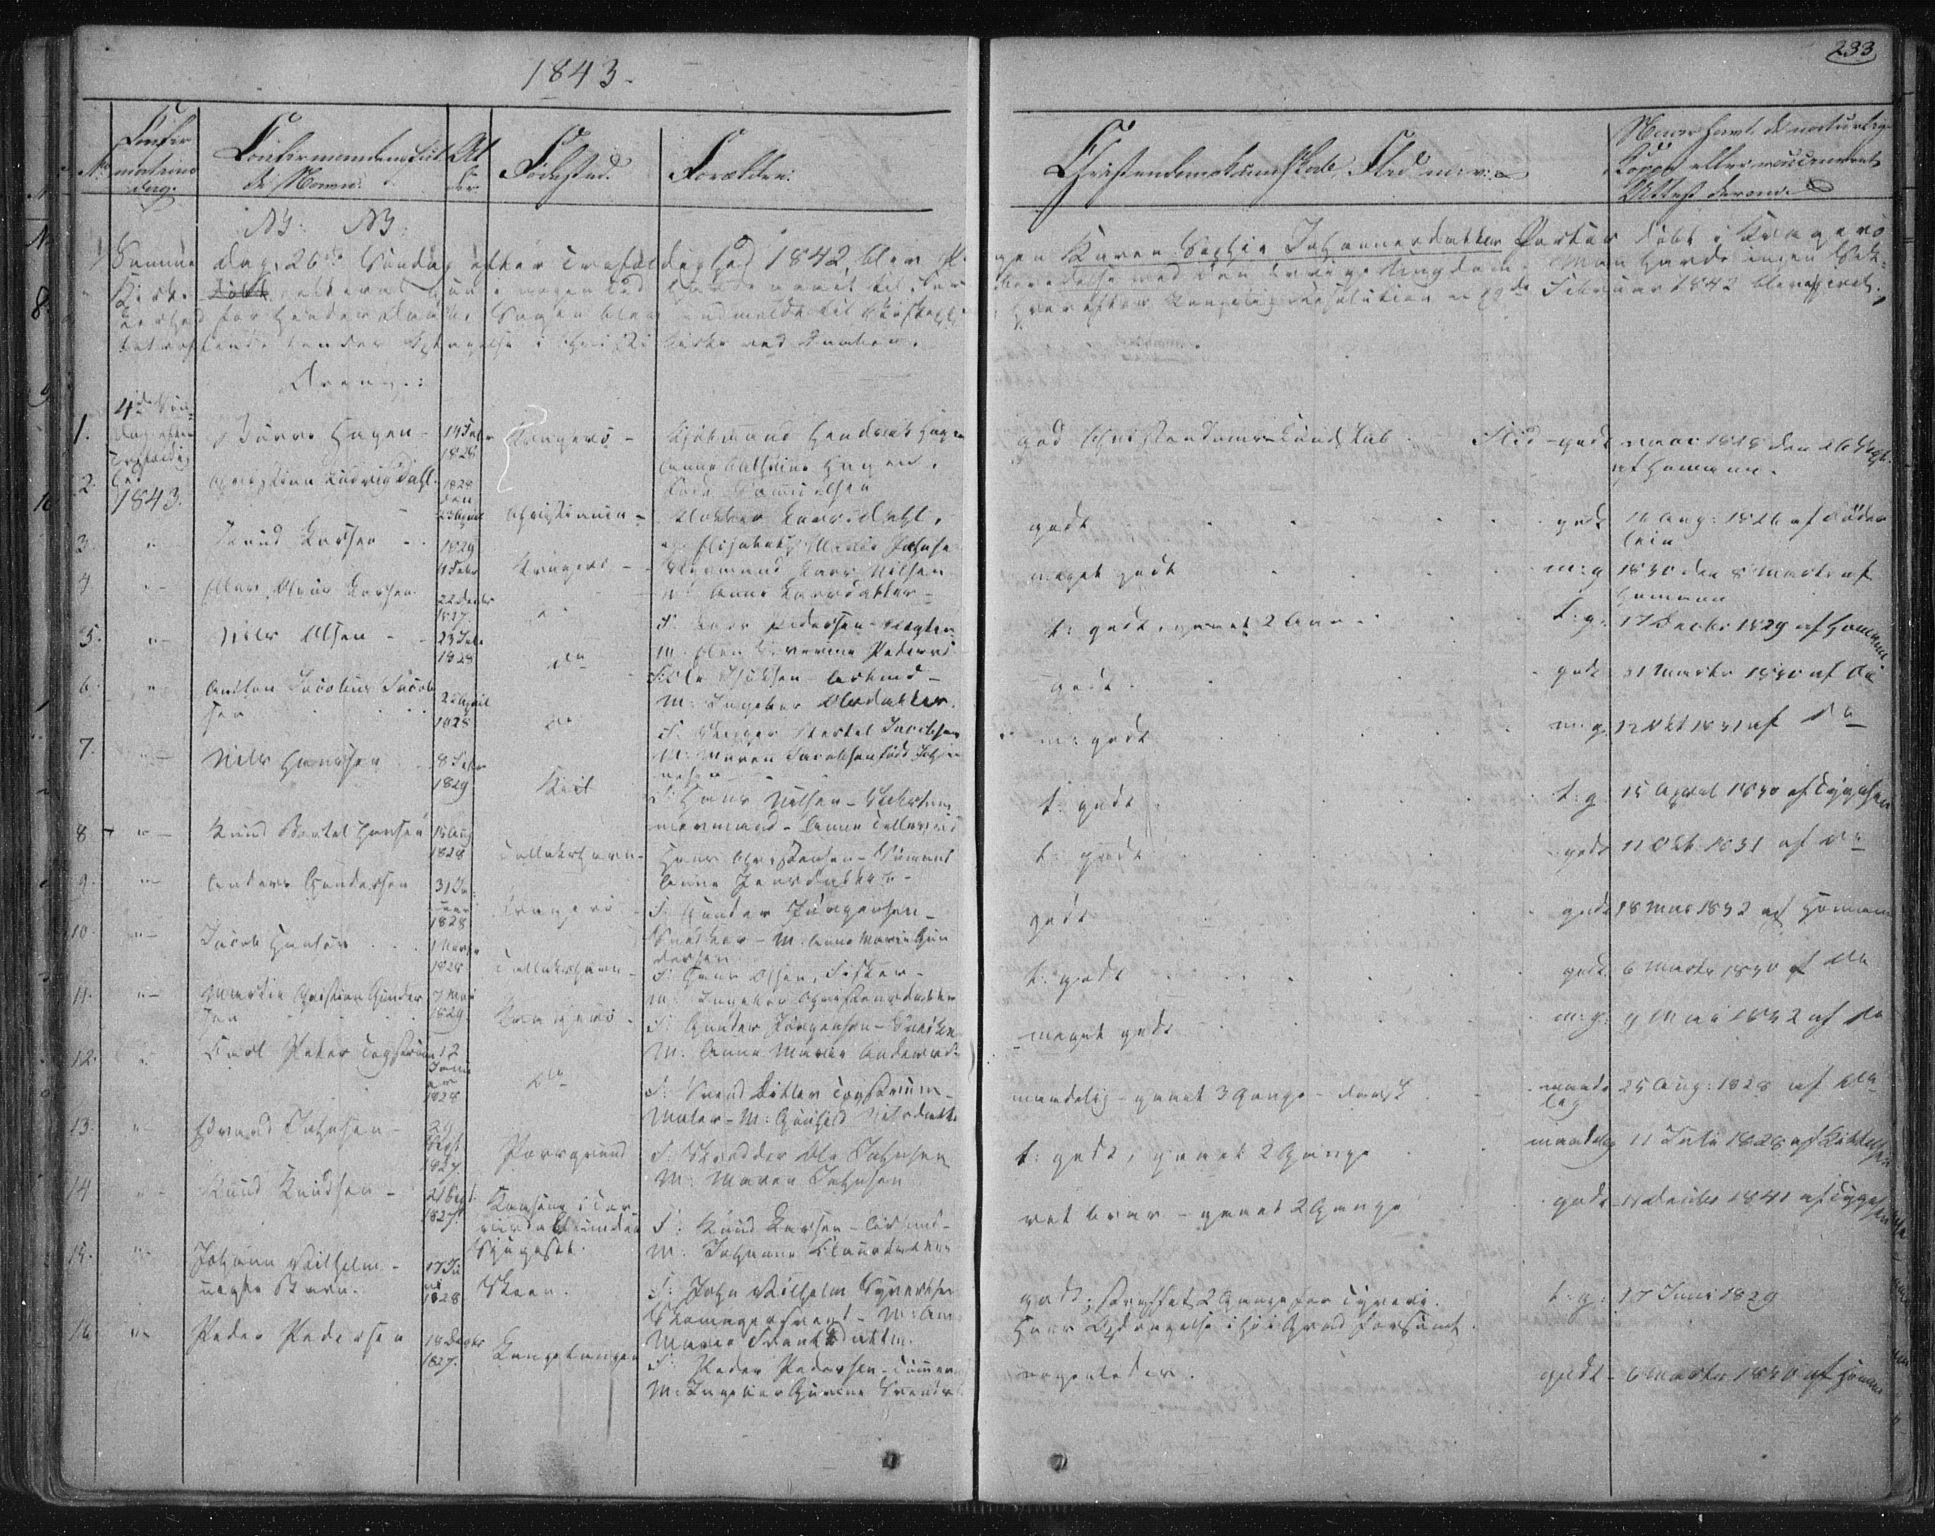 SAKO, Kragerø kirkebøker, F/Fa/L0005: Ministerialbok nr. 5, 1832-1847, s. 233